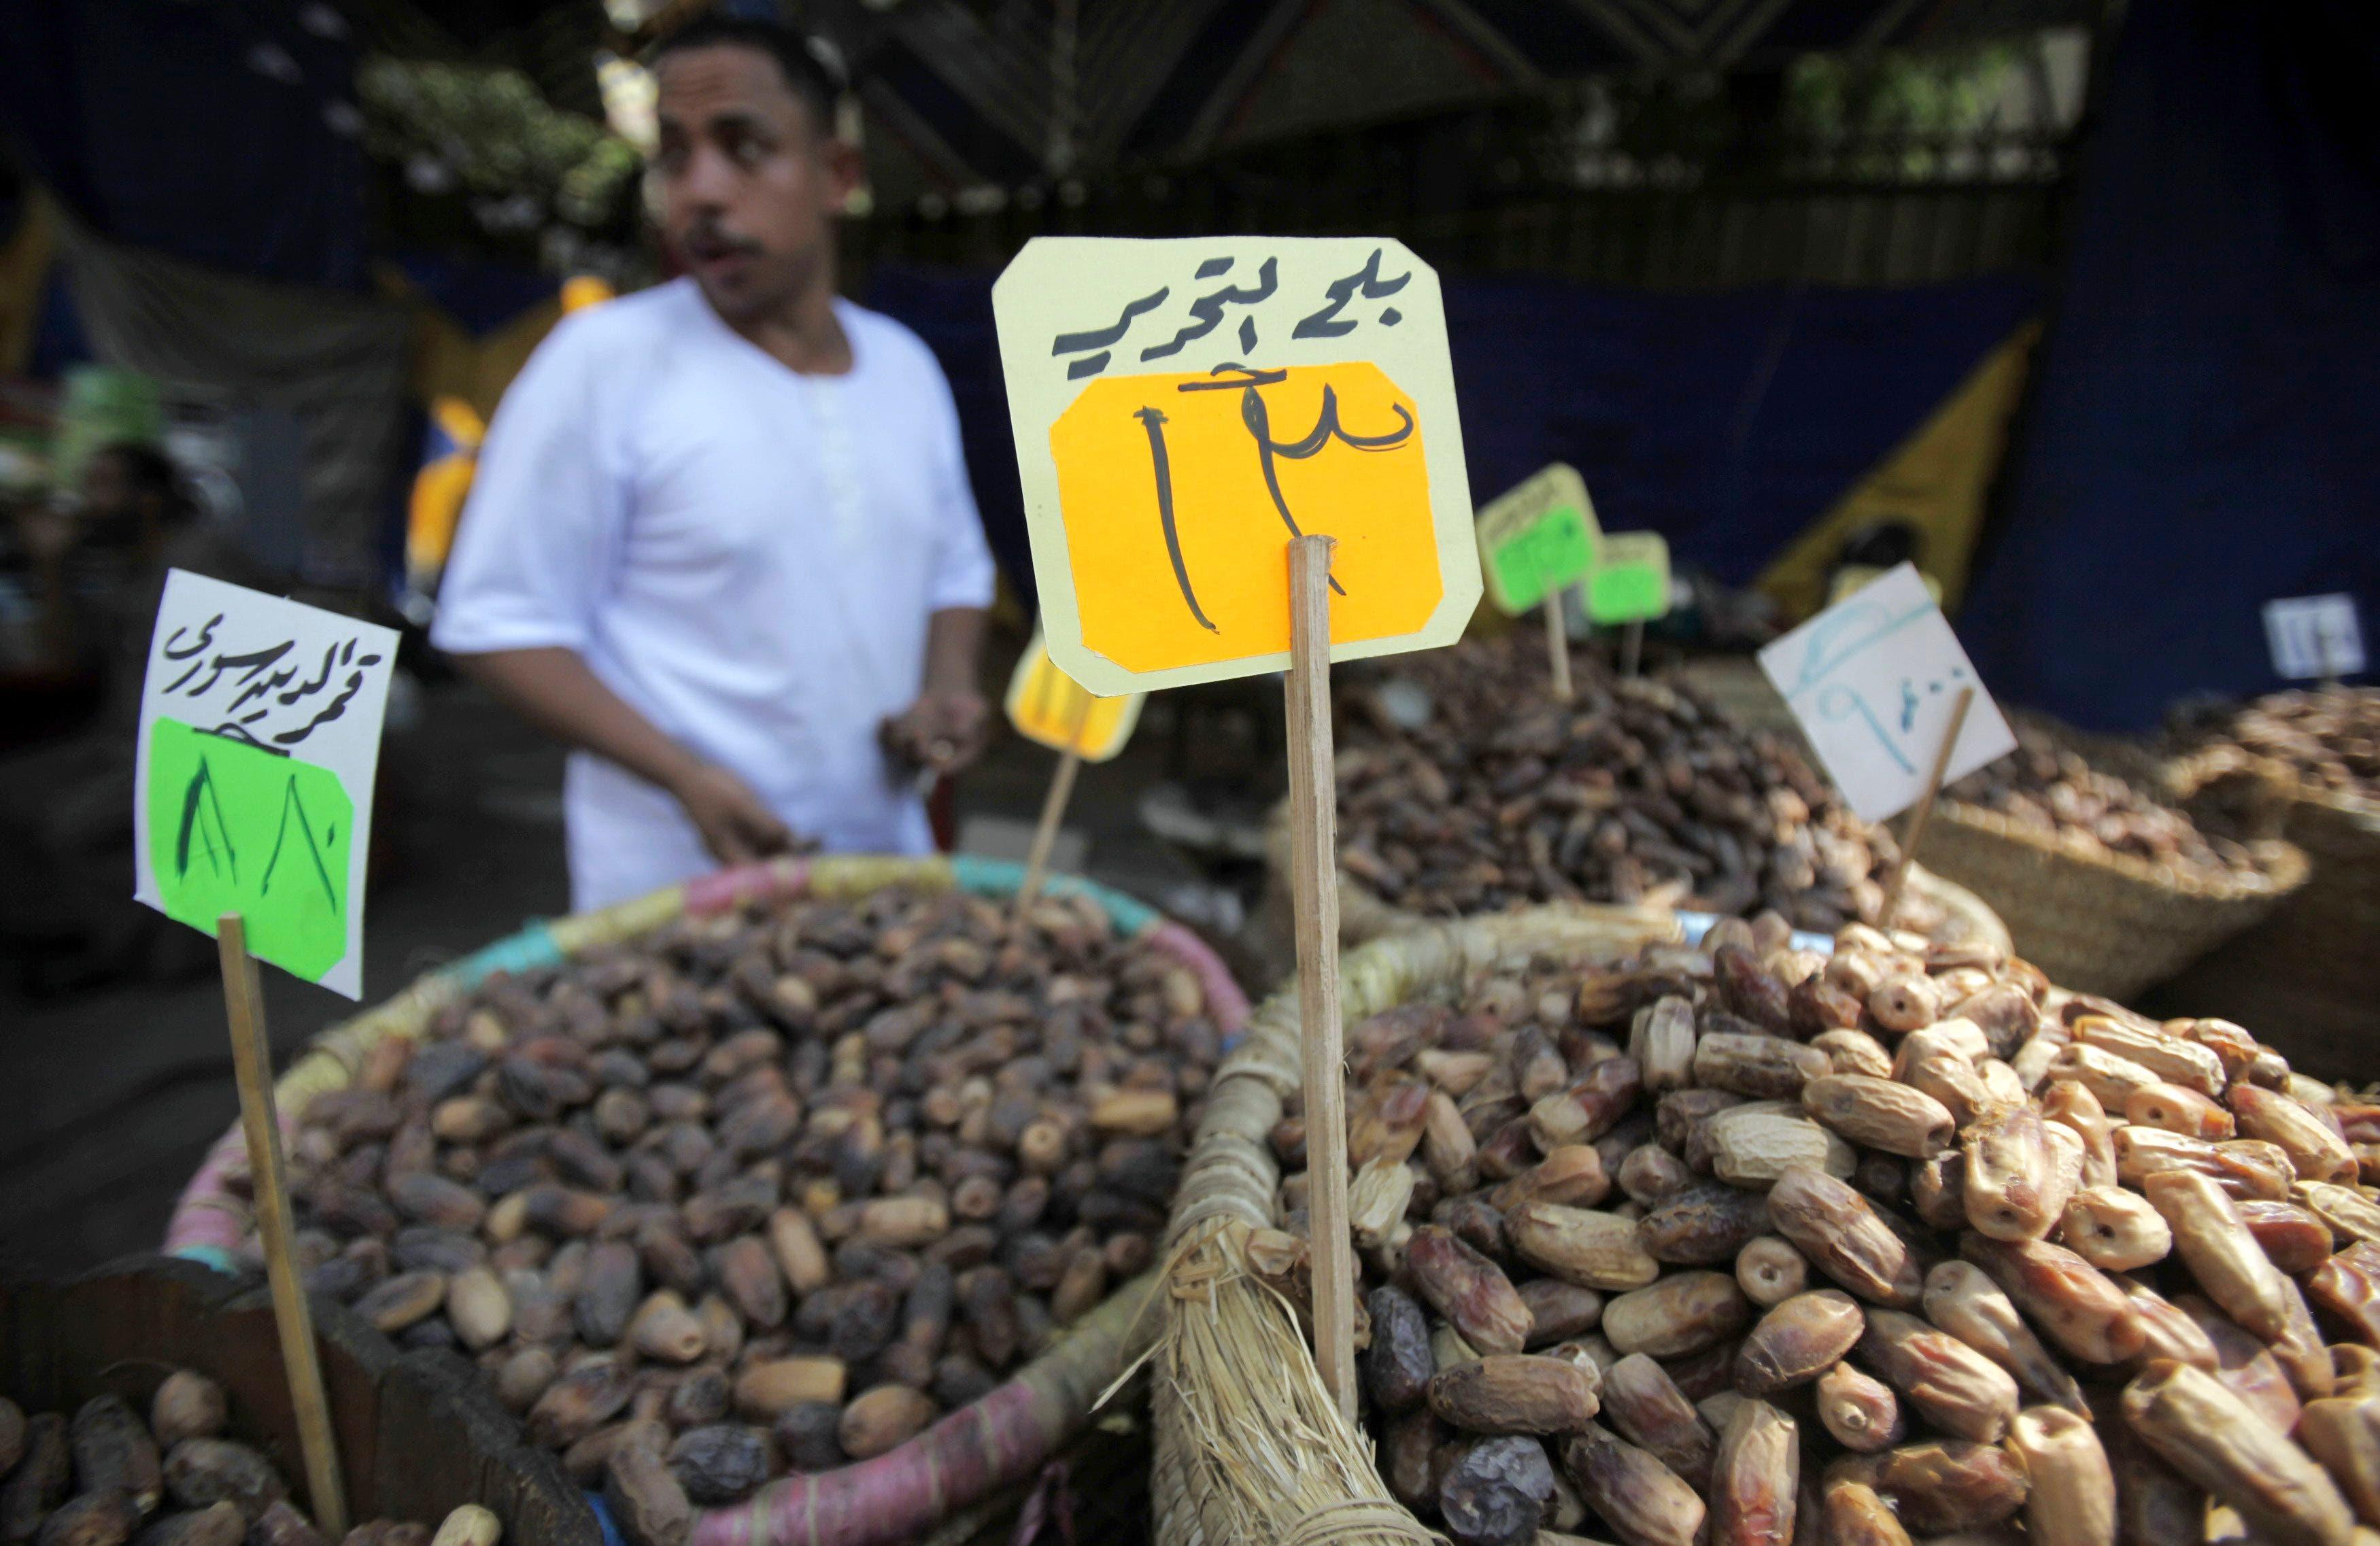 Egypt welcomes Ramadan with Sisi dates